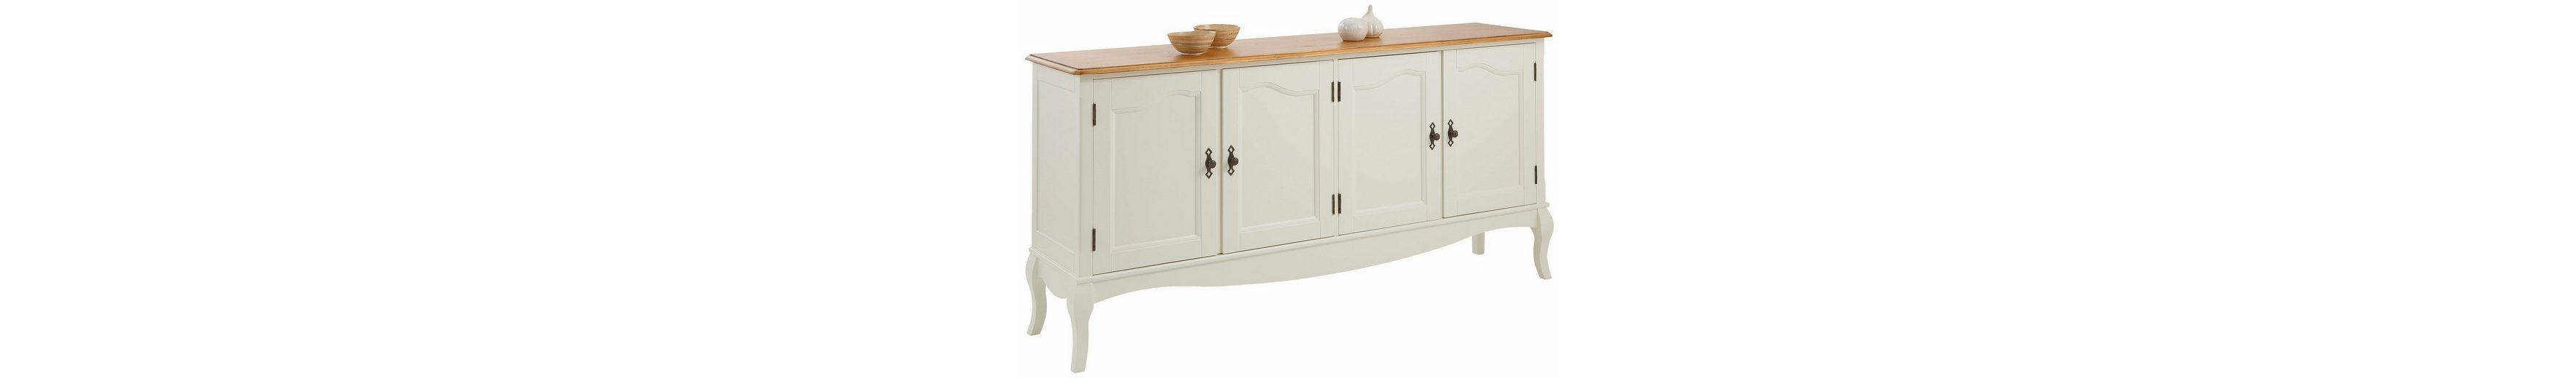 Home affaire Sideboard »Harmony«, Breite 178 cm